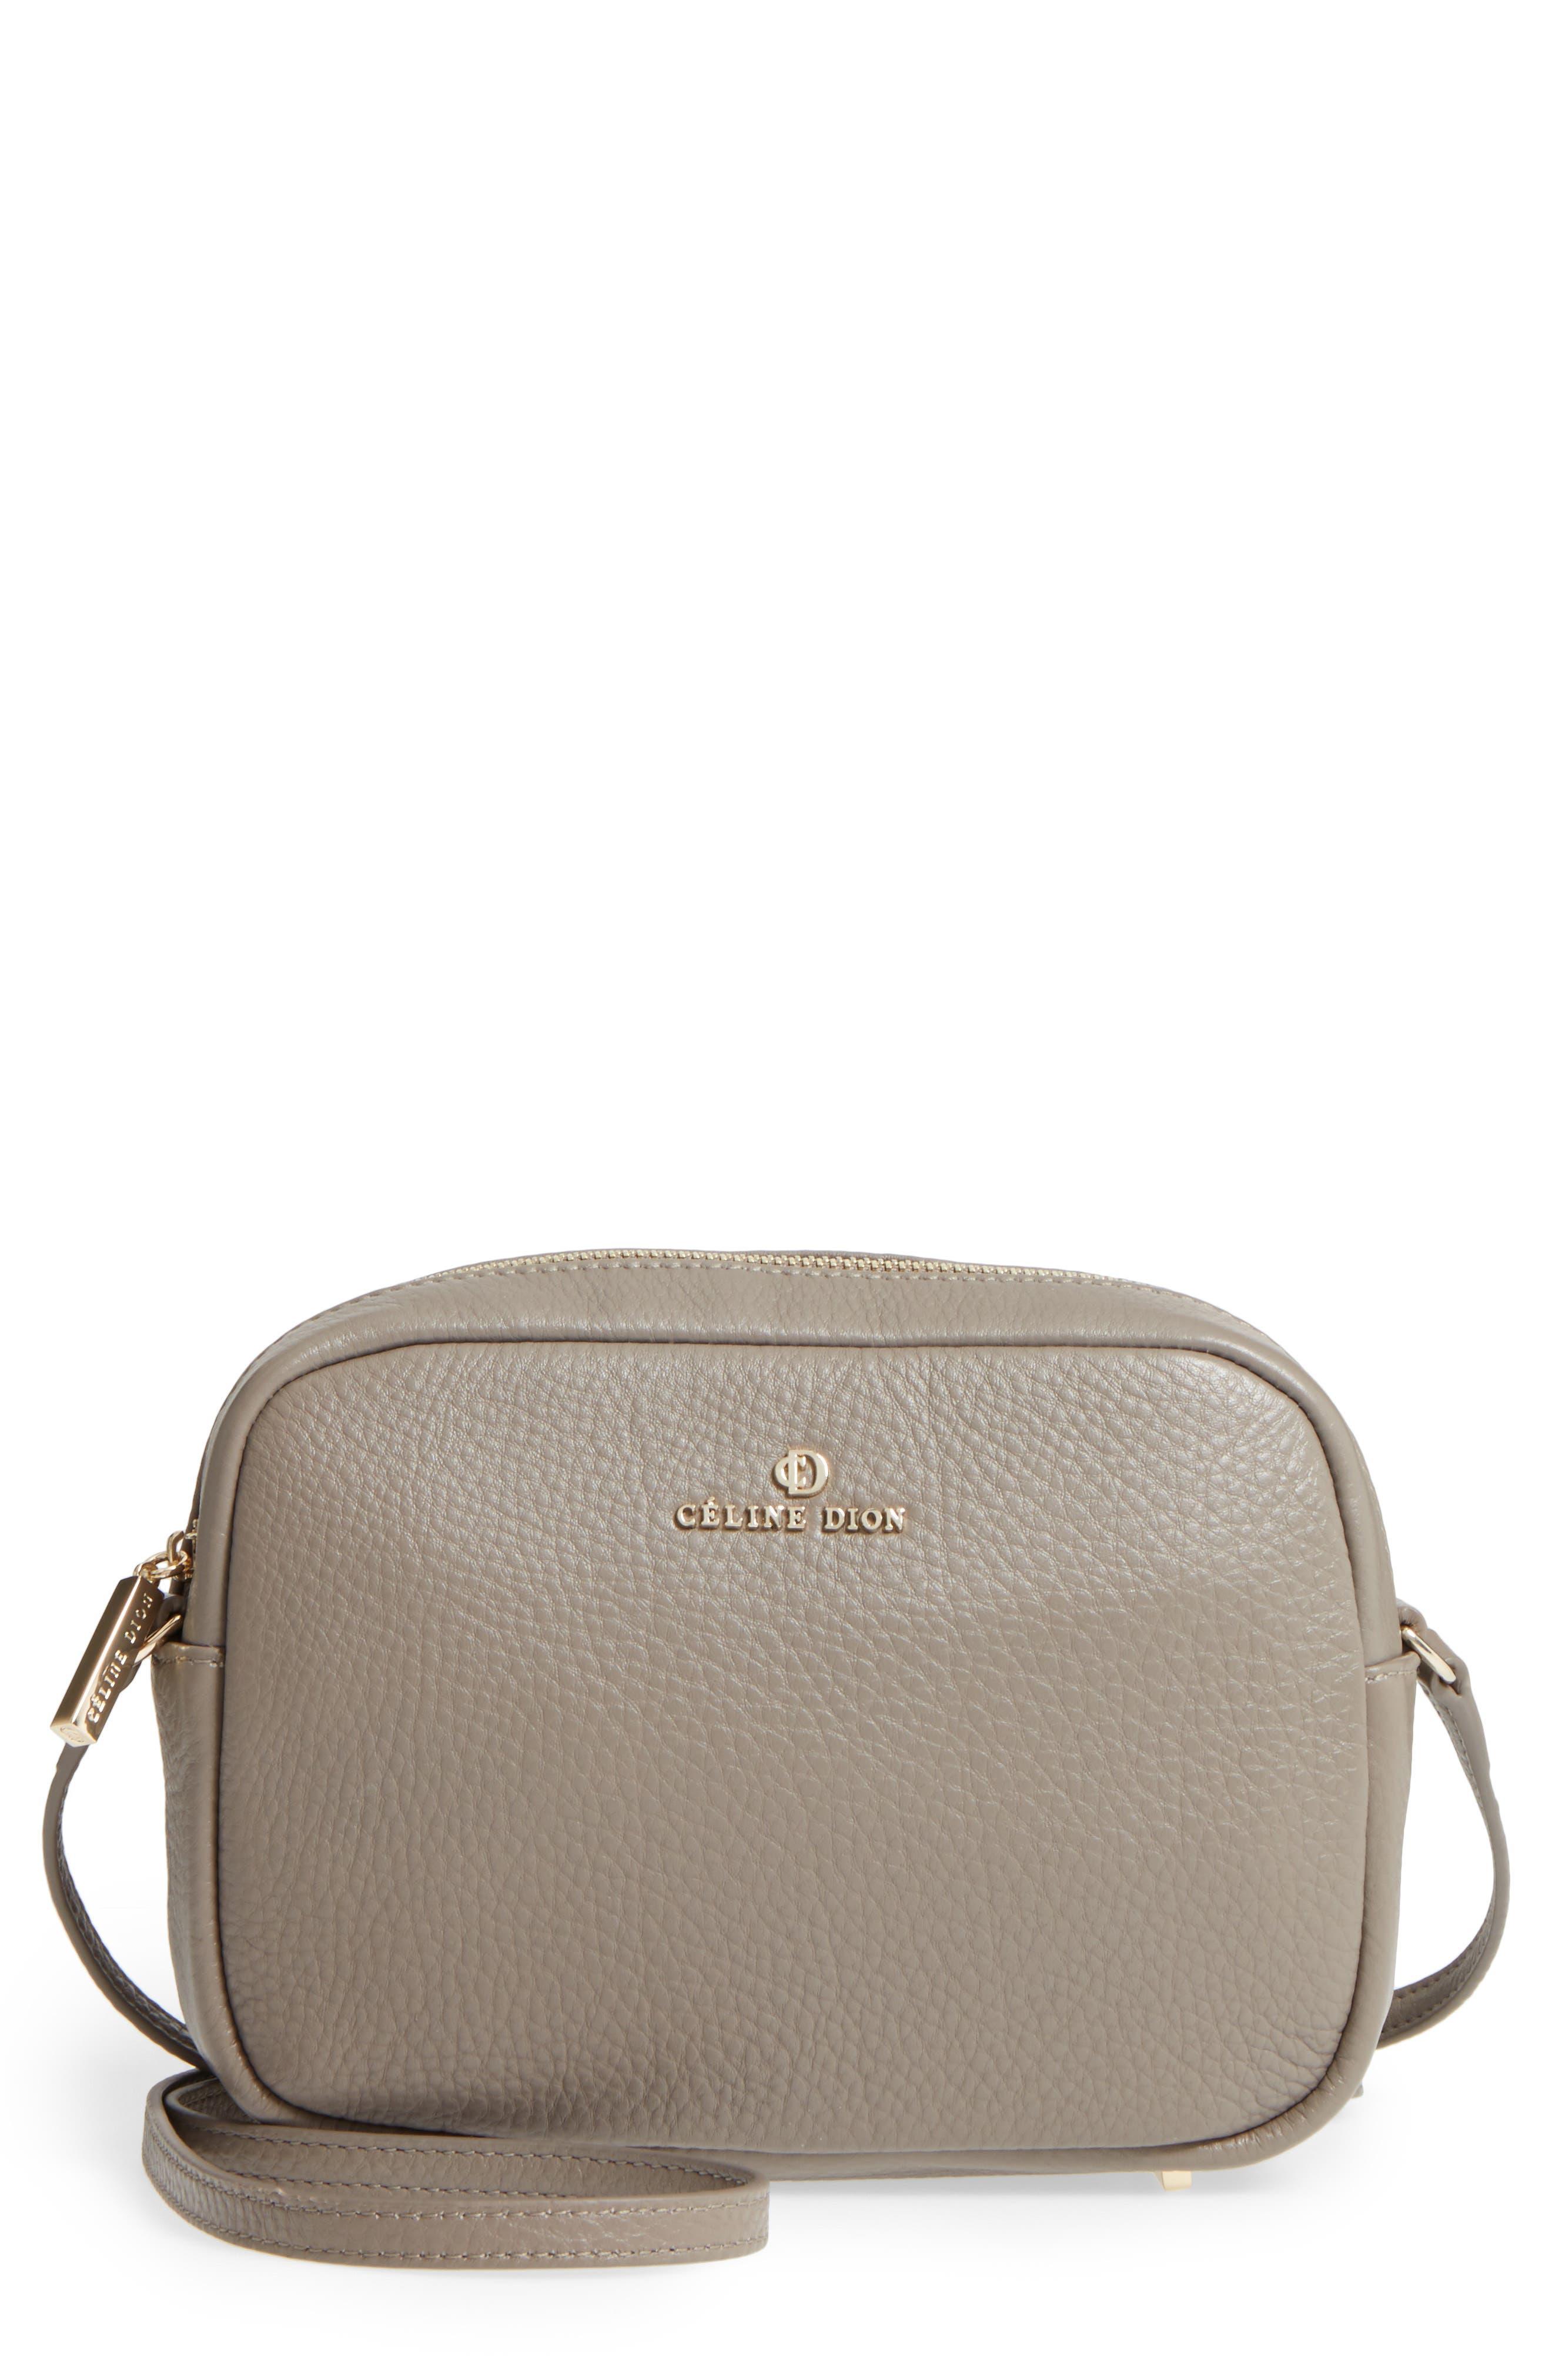 Alternate Image 1 Selected - Céline Dion Adagio Leather Camera Crossbody Bag